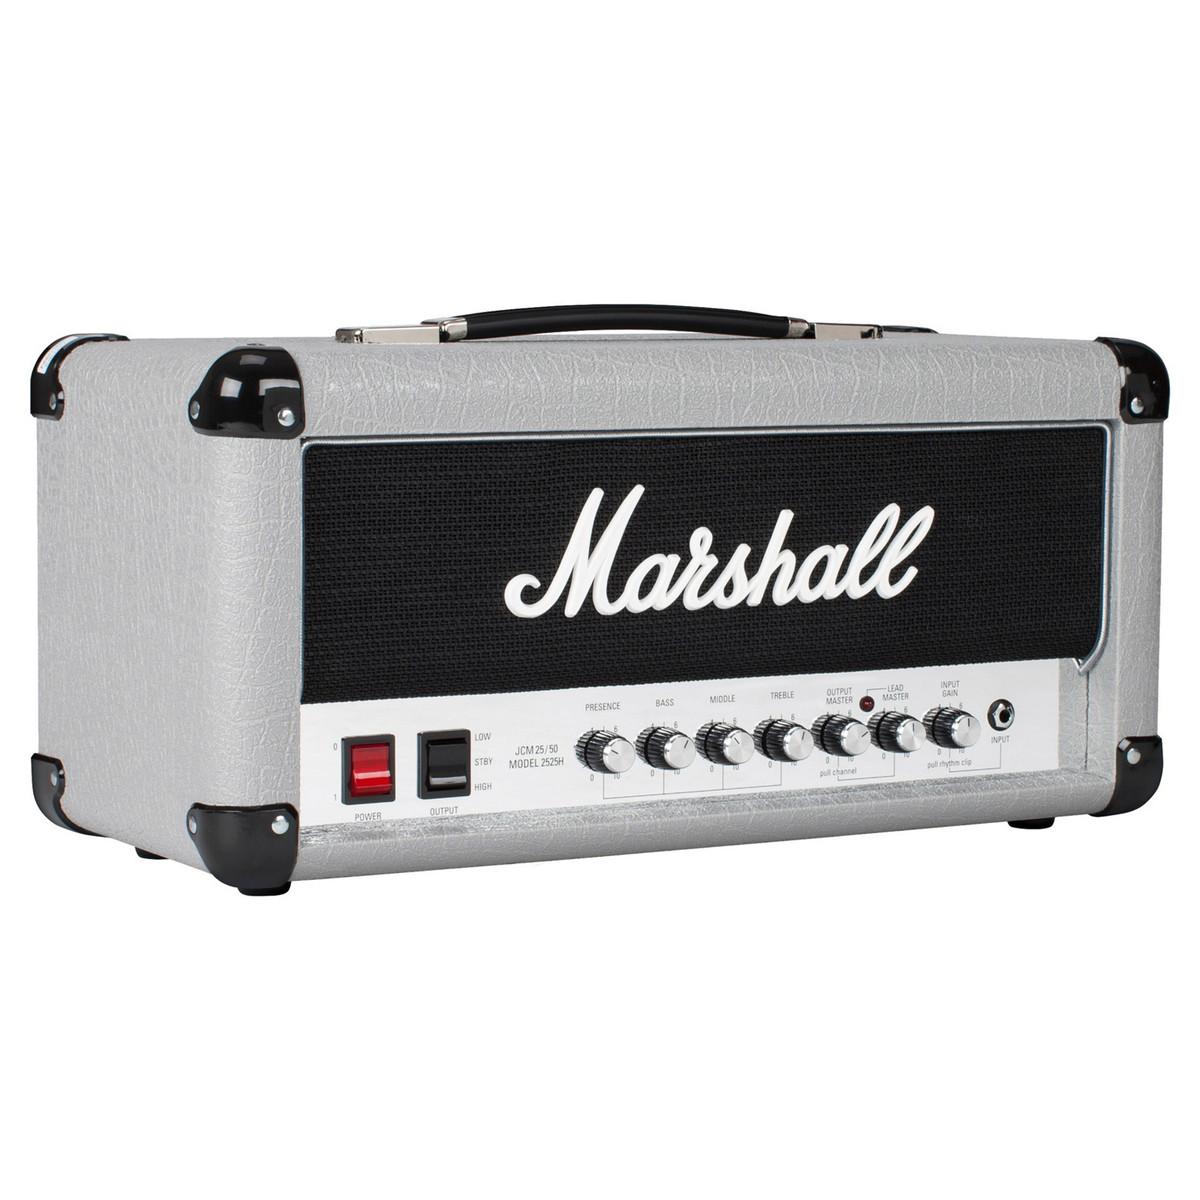 marshall 2525h 20 watt mini jubilee guitar amp head box opened at. Black Bedroom Furniture Sets. Home Design Ideas